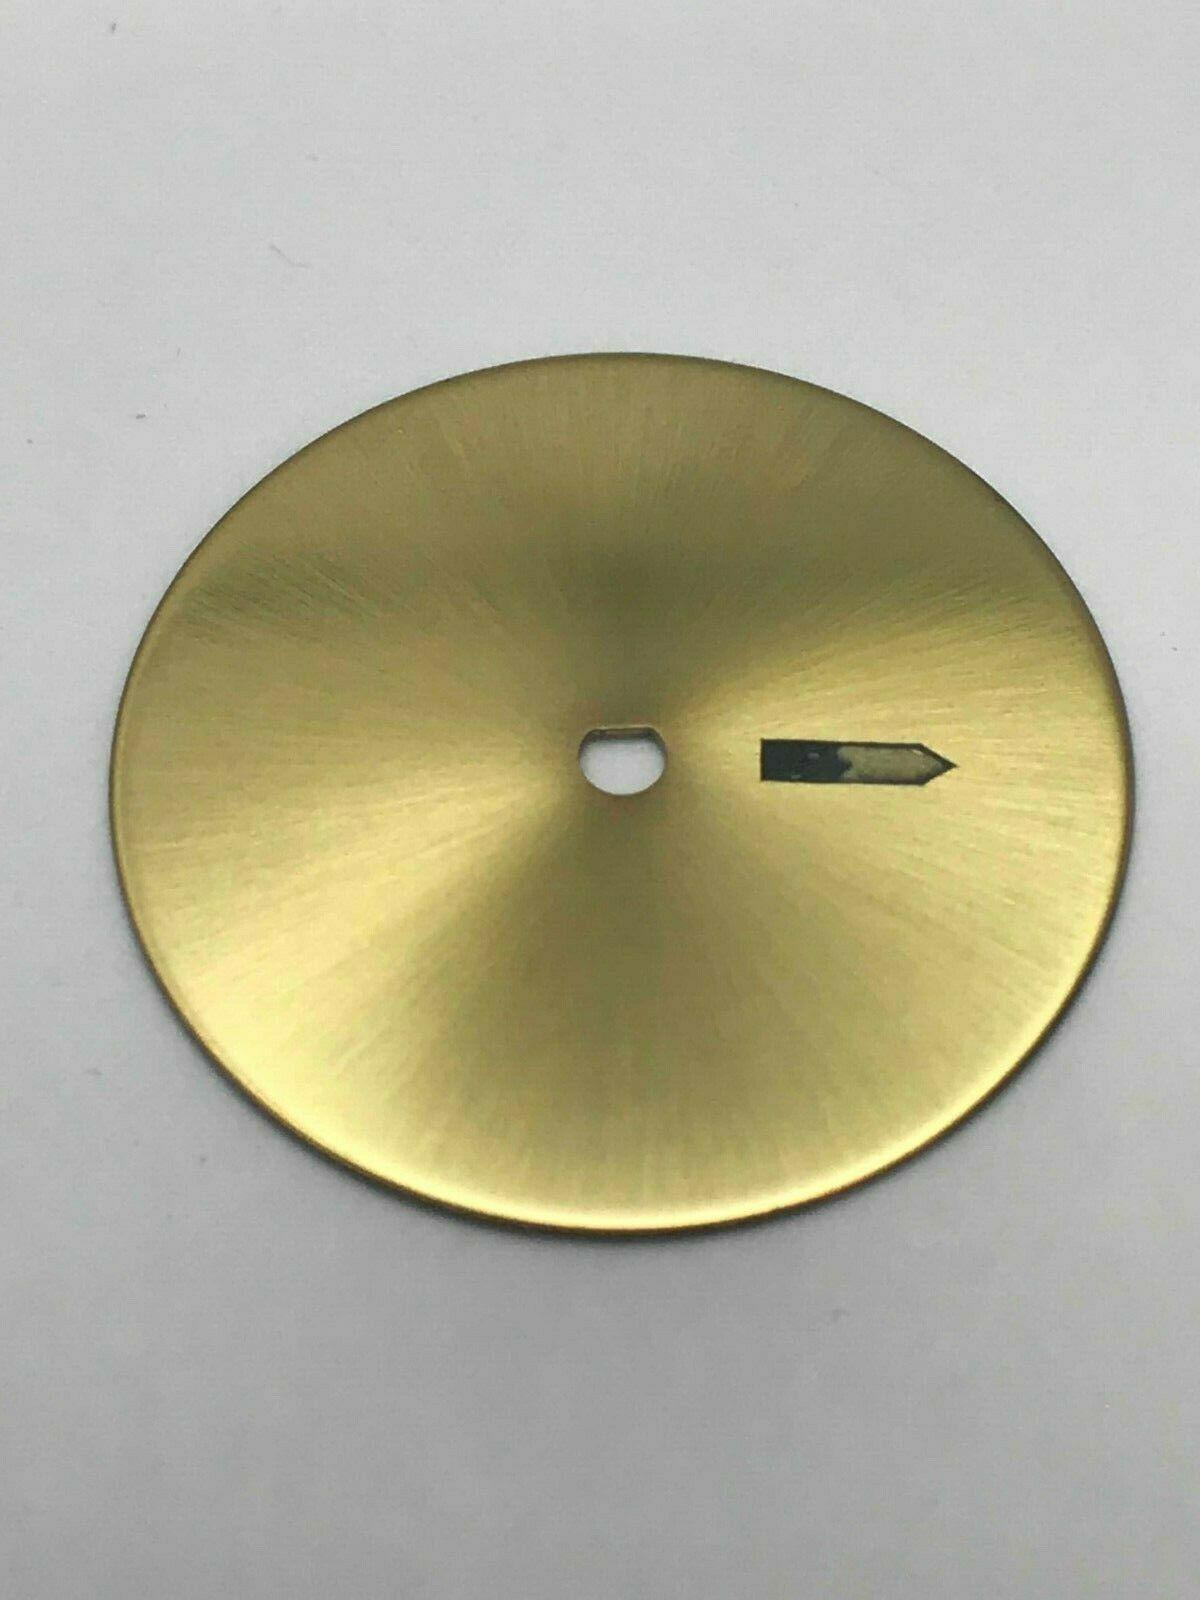 Zodiac 70 Olympus Gold Hour Dial